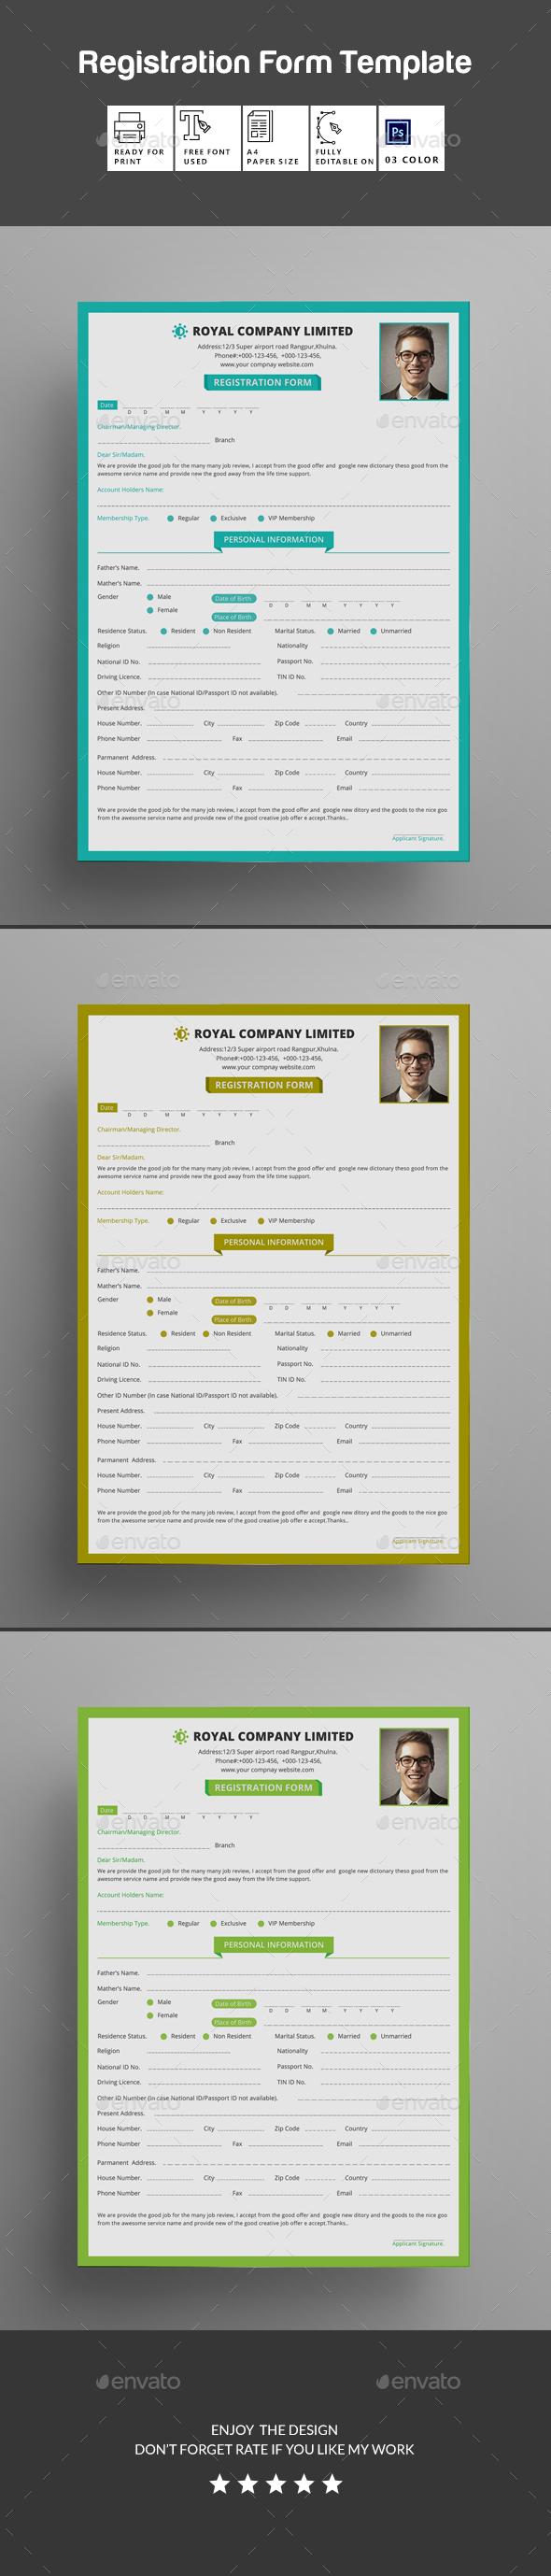 GraphicRiver Registration Form 20540885